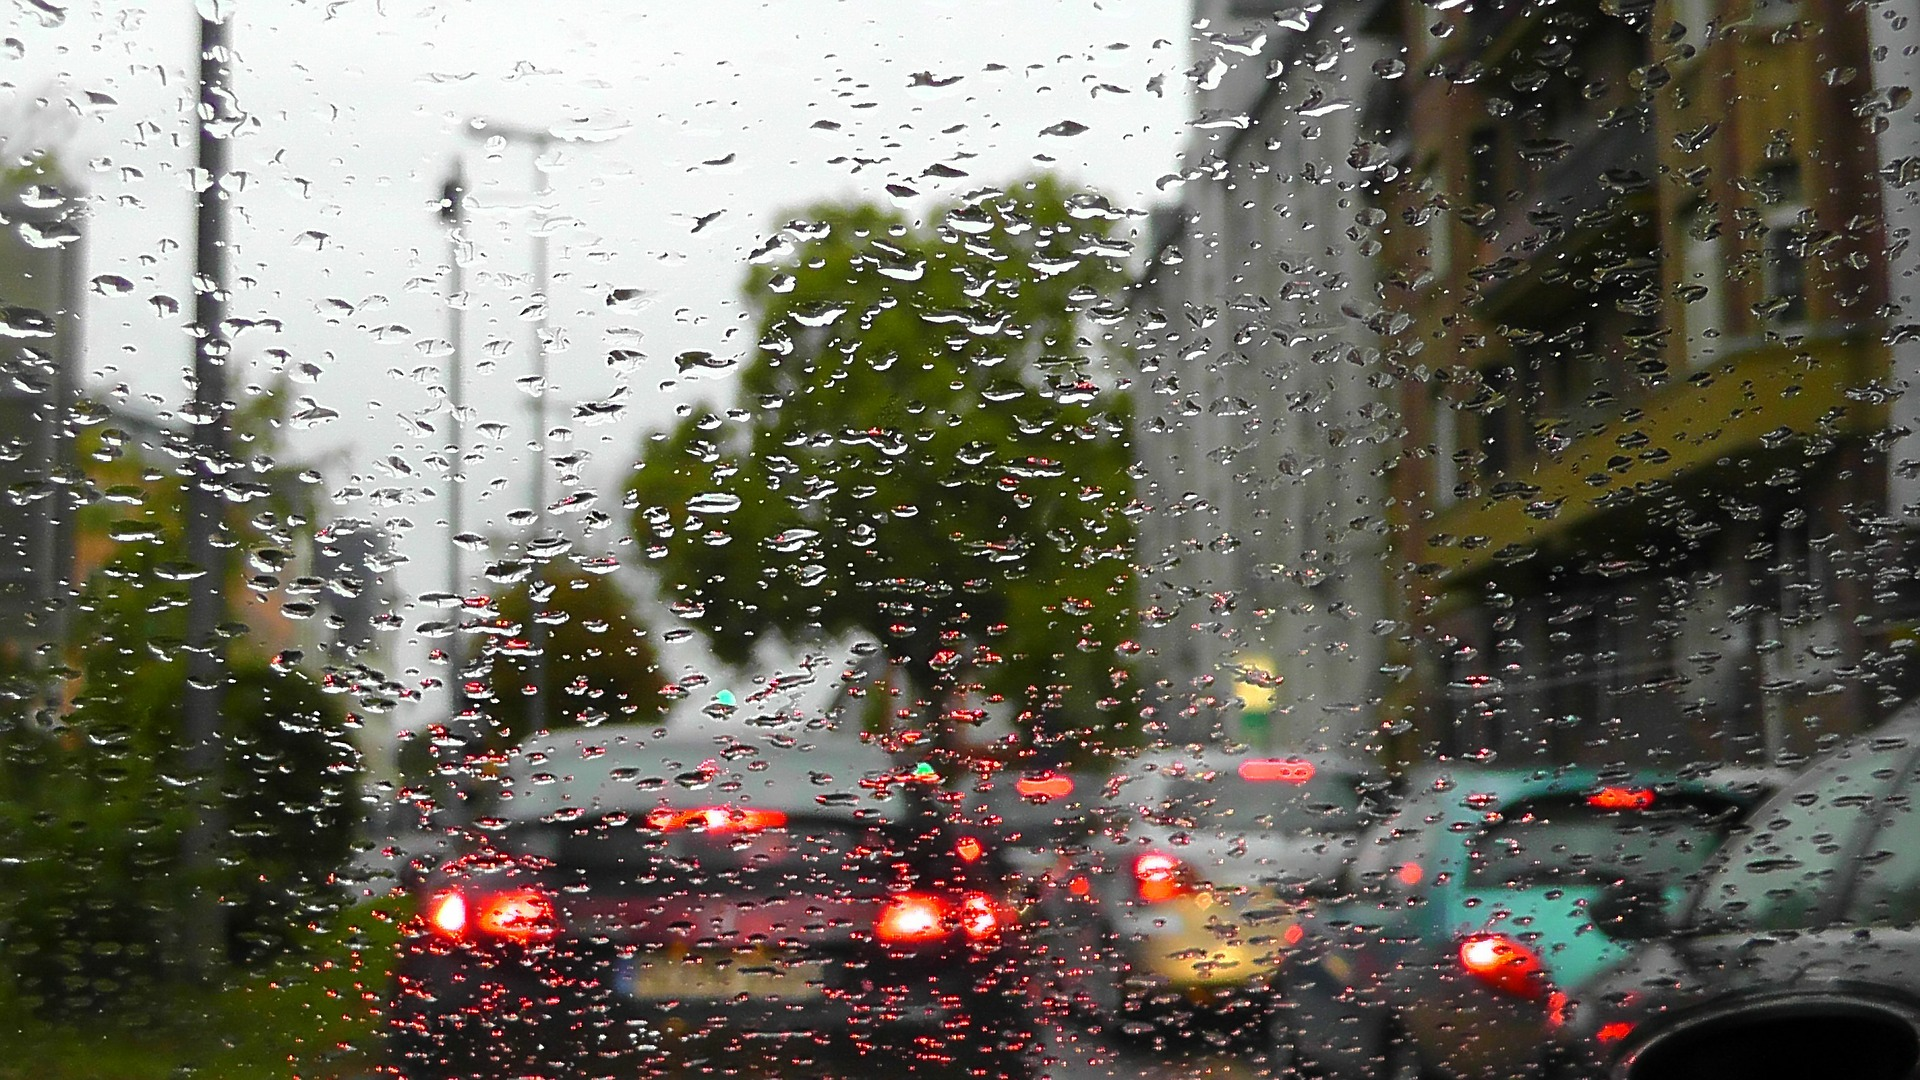 rain-77339_1920.jpg